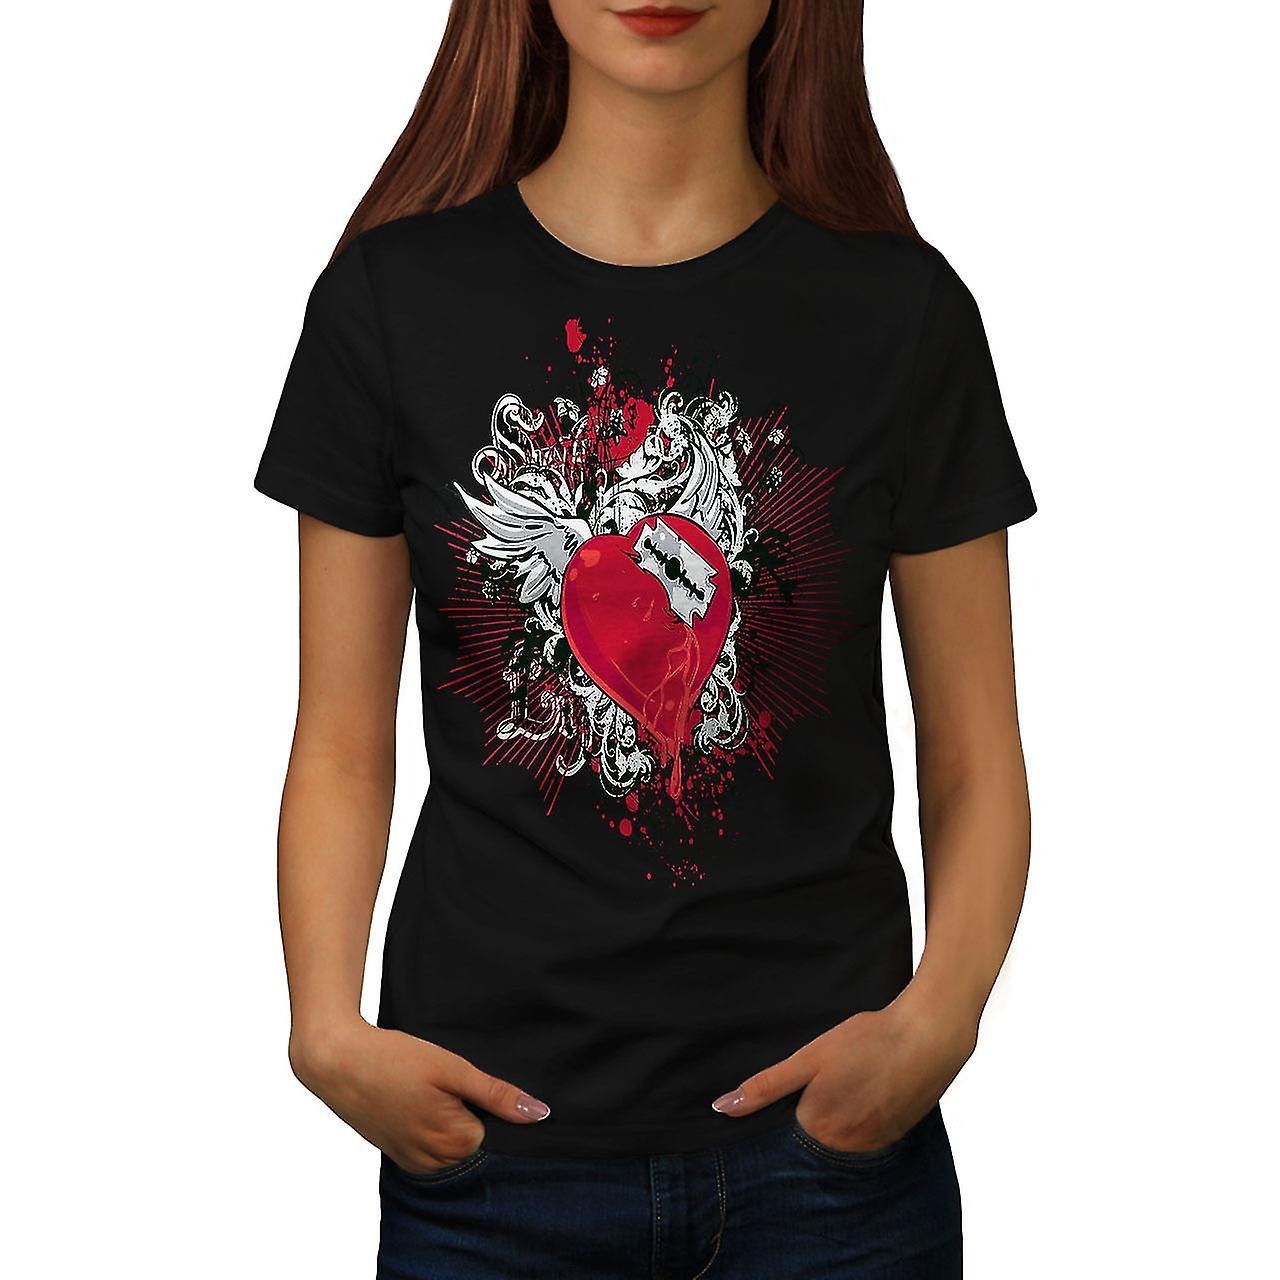 Broken Heart Cool Fashion Women Black T-shirt | Wellcoda